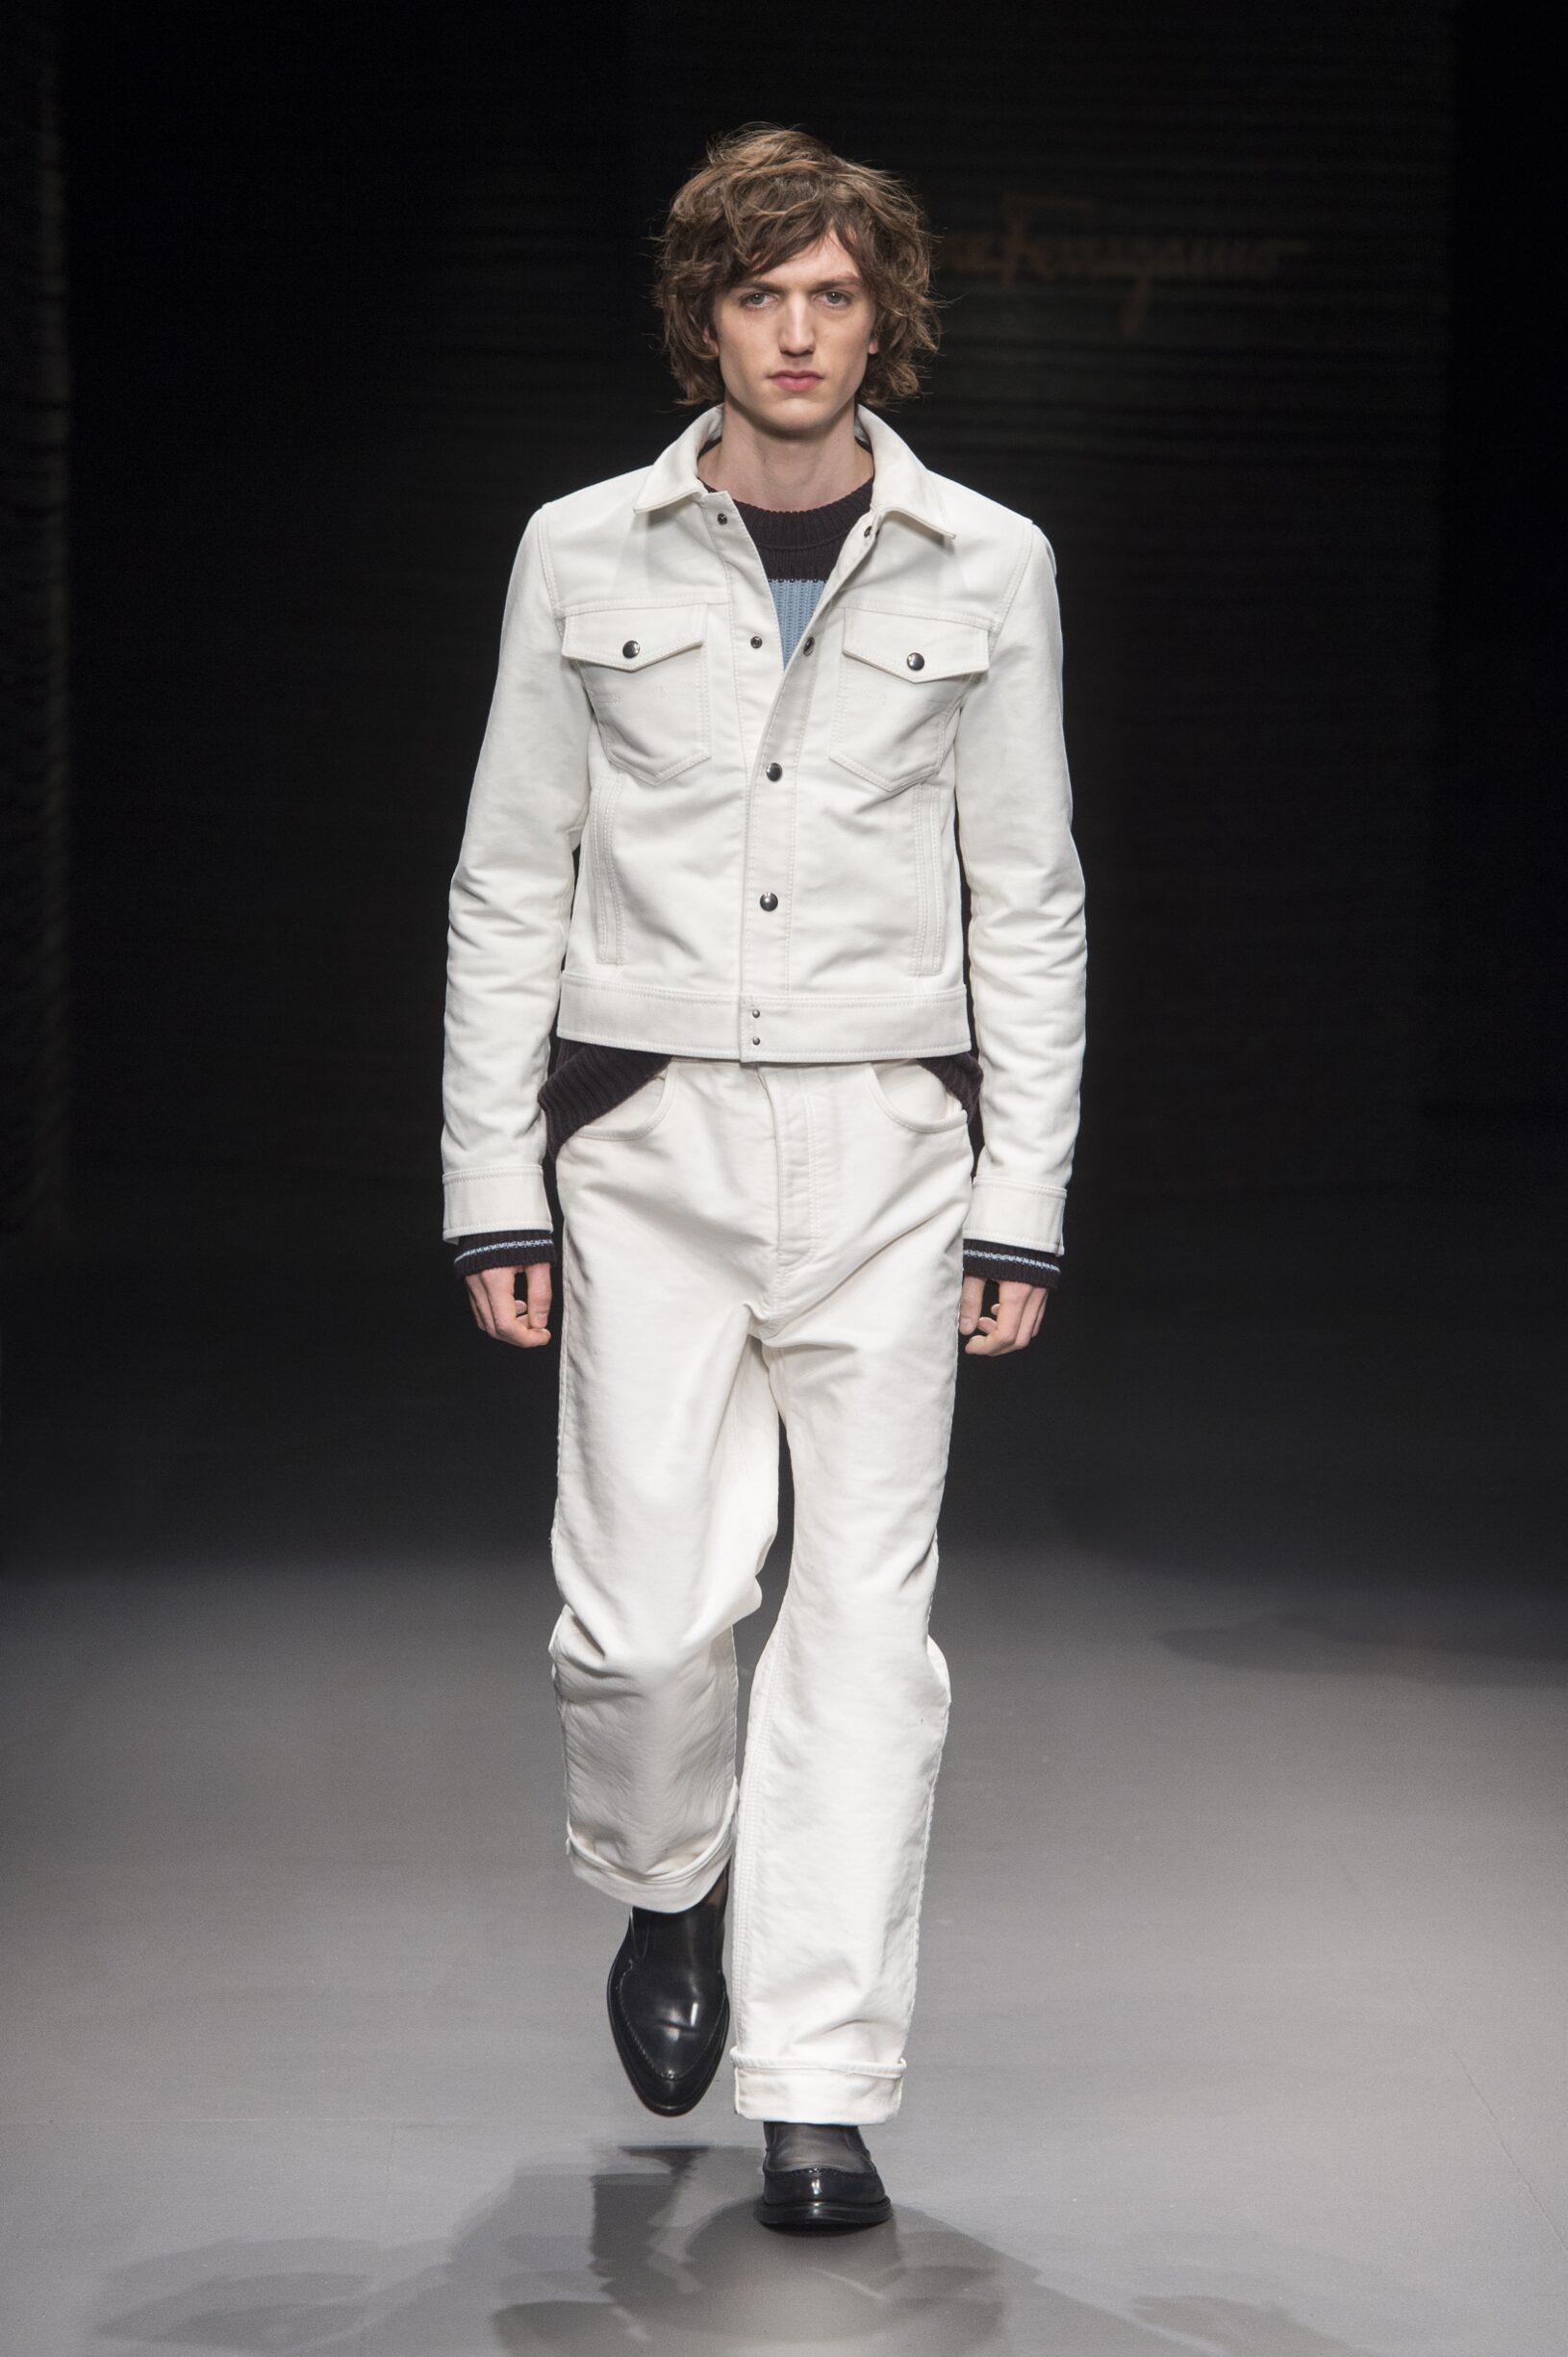 Catwalk Salvatore Ferragamo Man Fashion Show Winter 2017